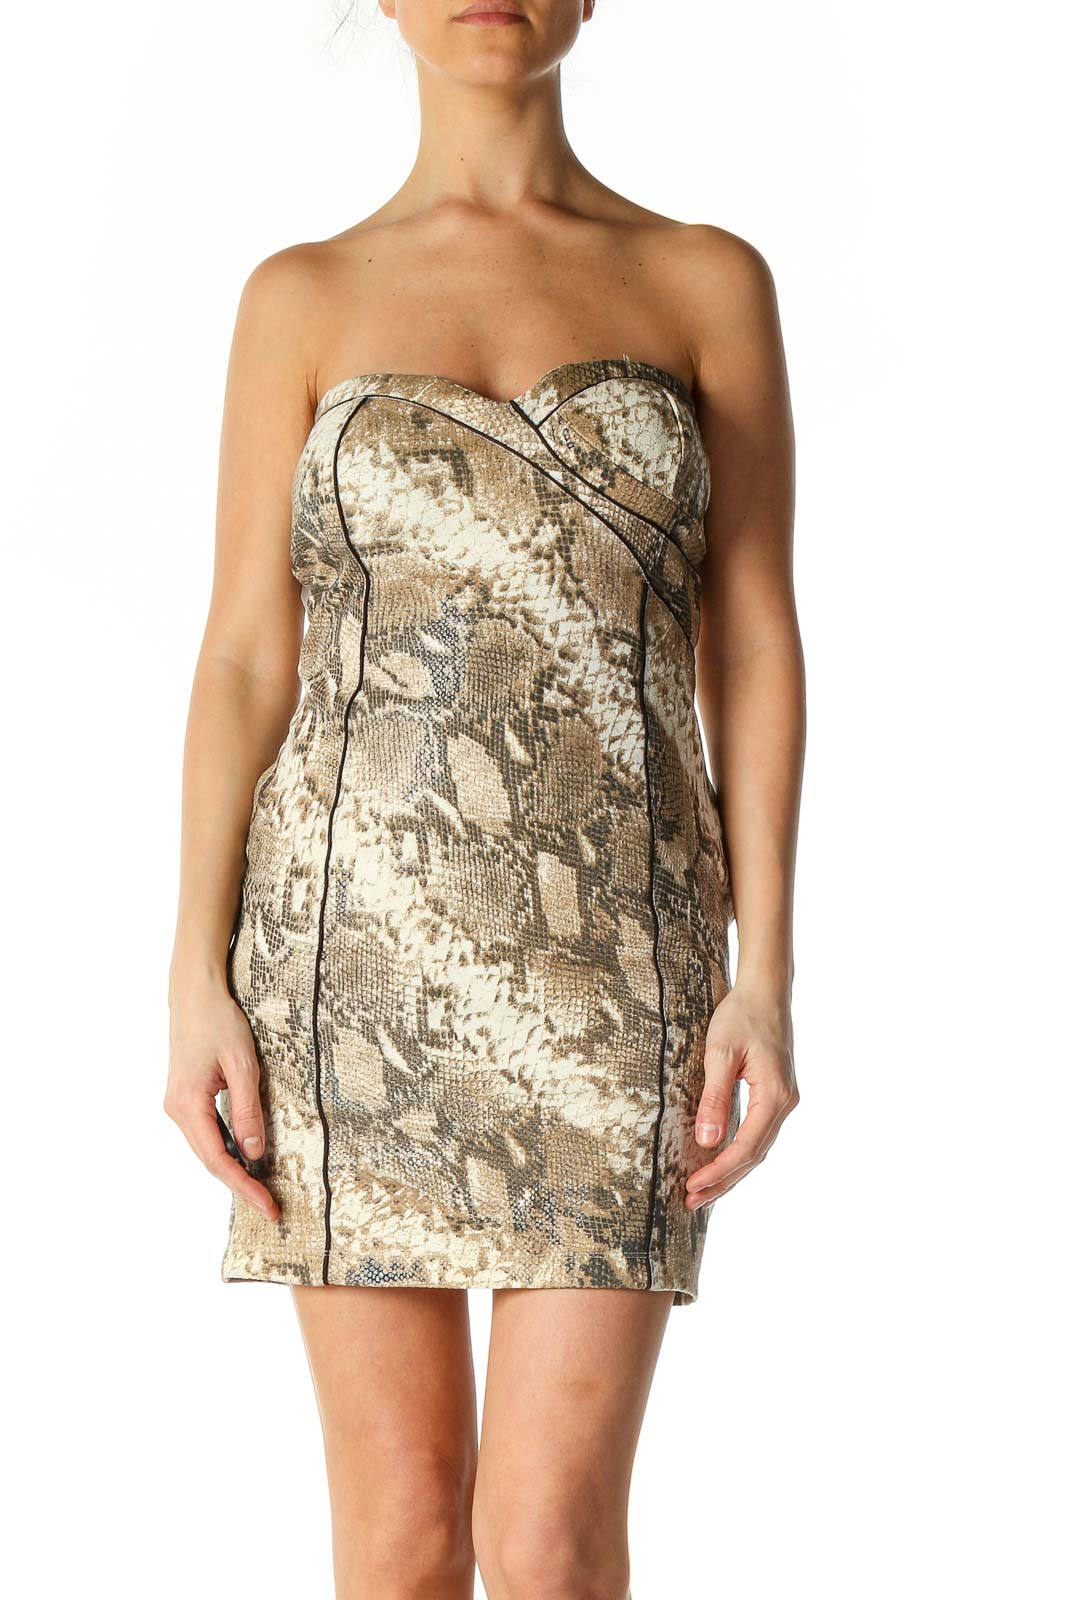 Gray Animal Print Chic Sheath Dress Front